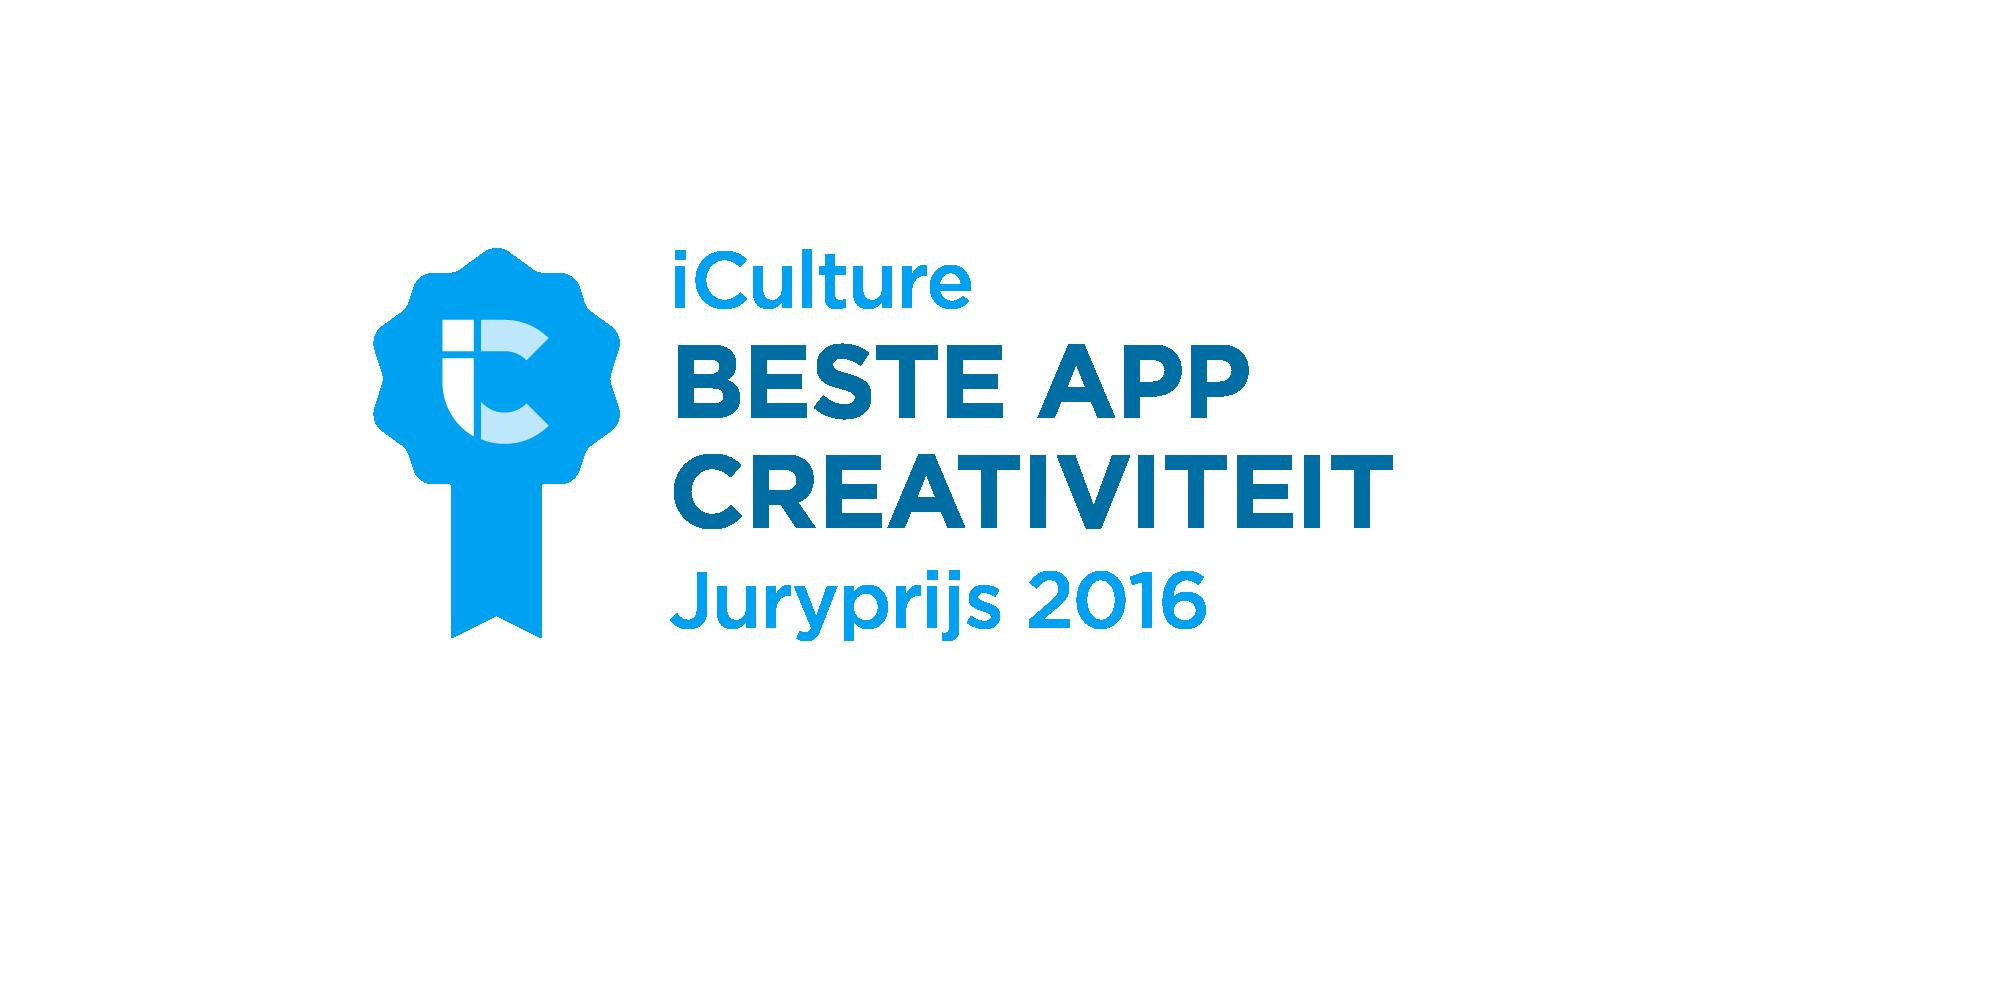 iCulture Beste App Creativiteit 2016